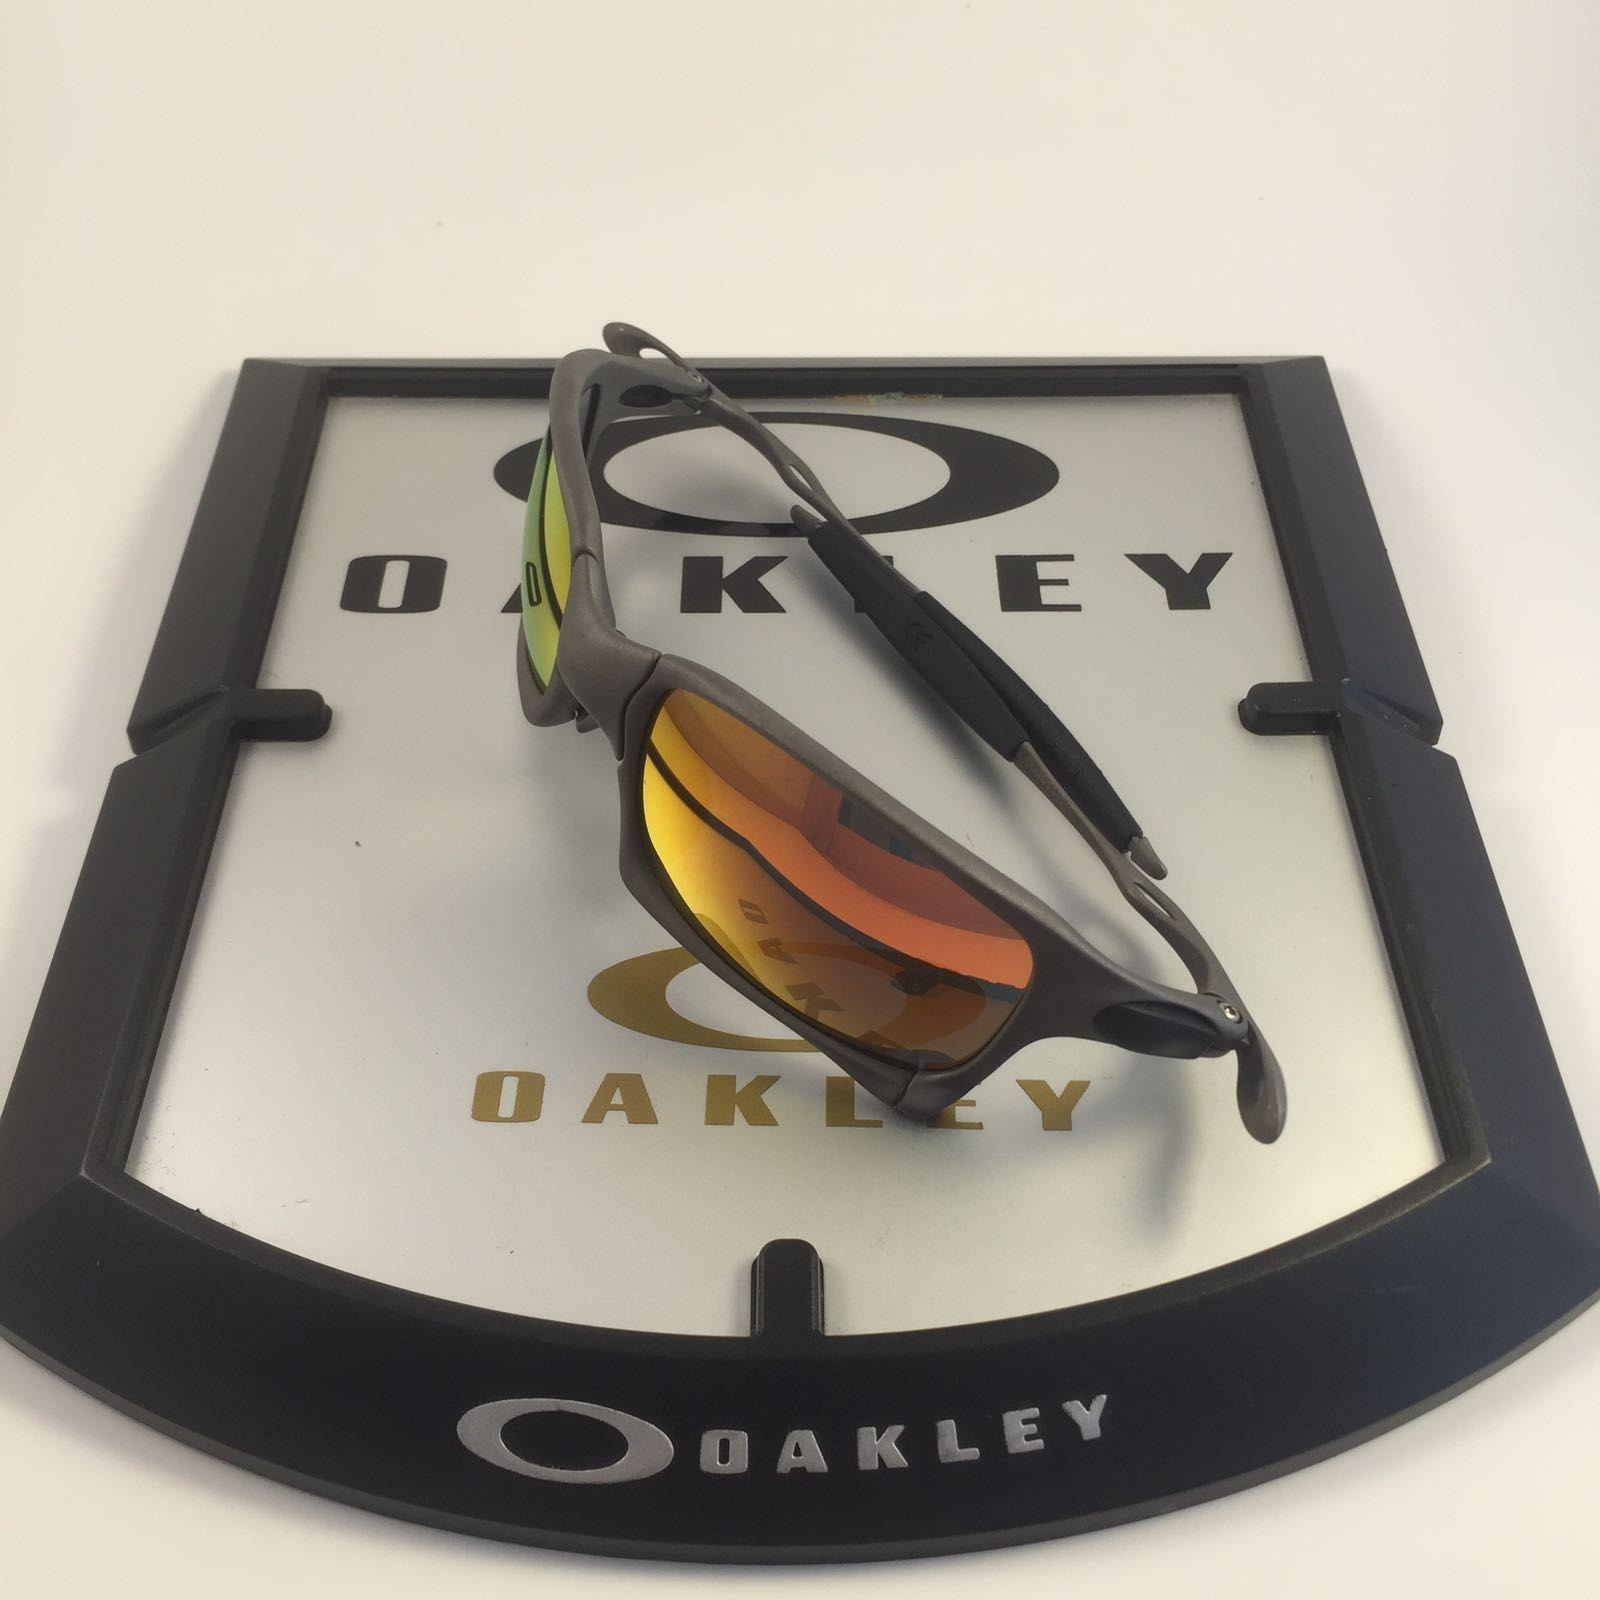 oakley x squared x-metal - 8577d249-3ada-491d-9649-fd756a7f3da6.jpeg